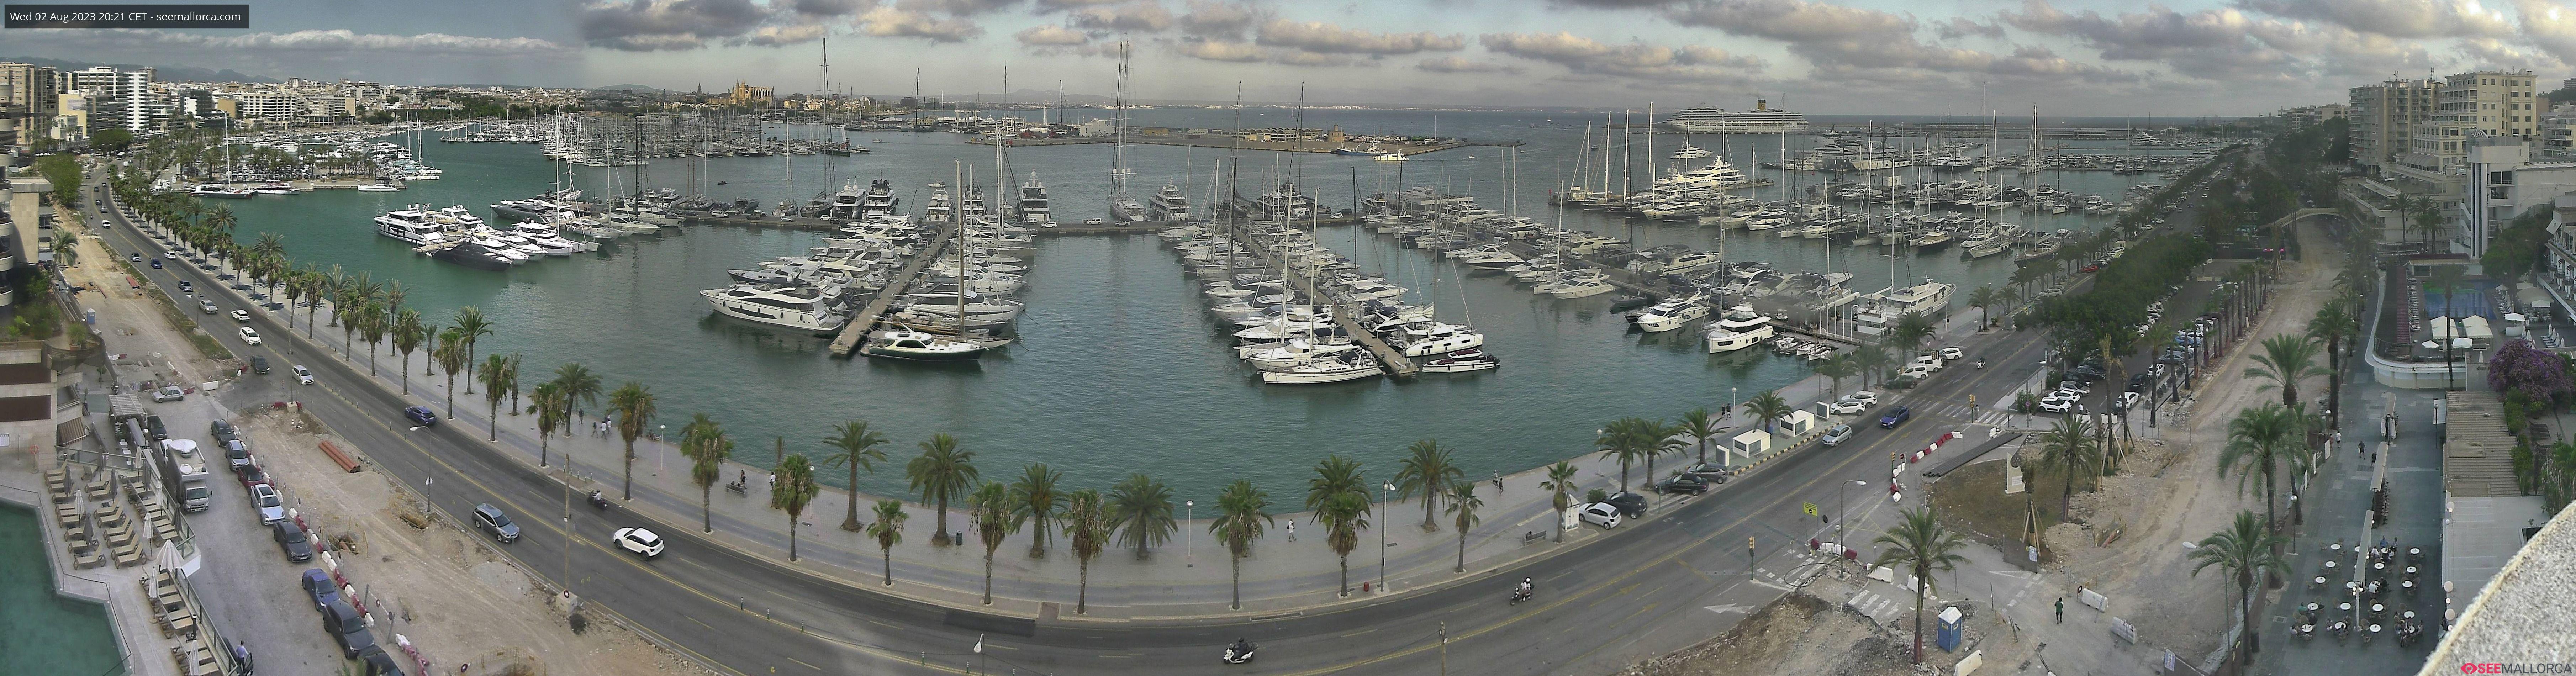 Онлайн веб камера Испания набережная Пальма-де-Майорка